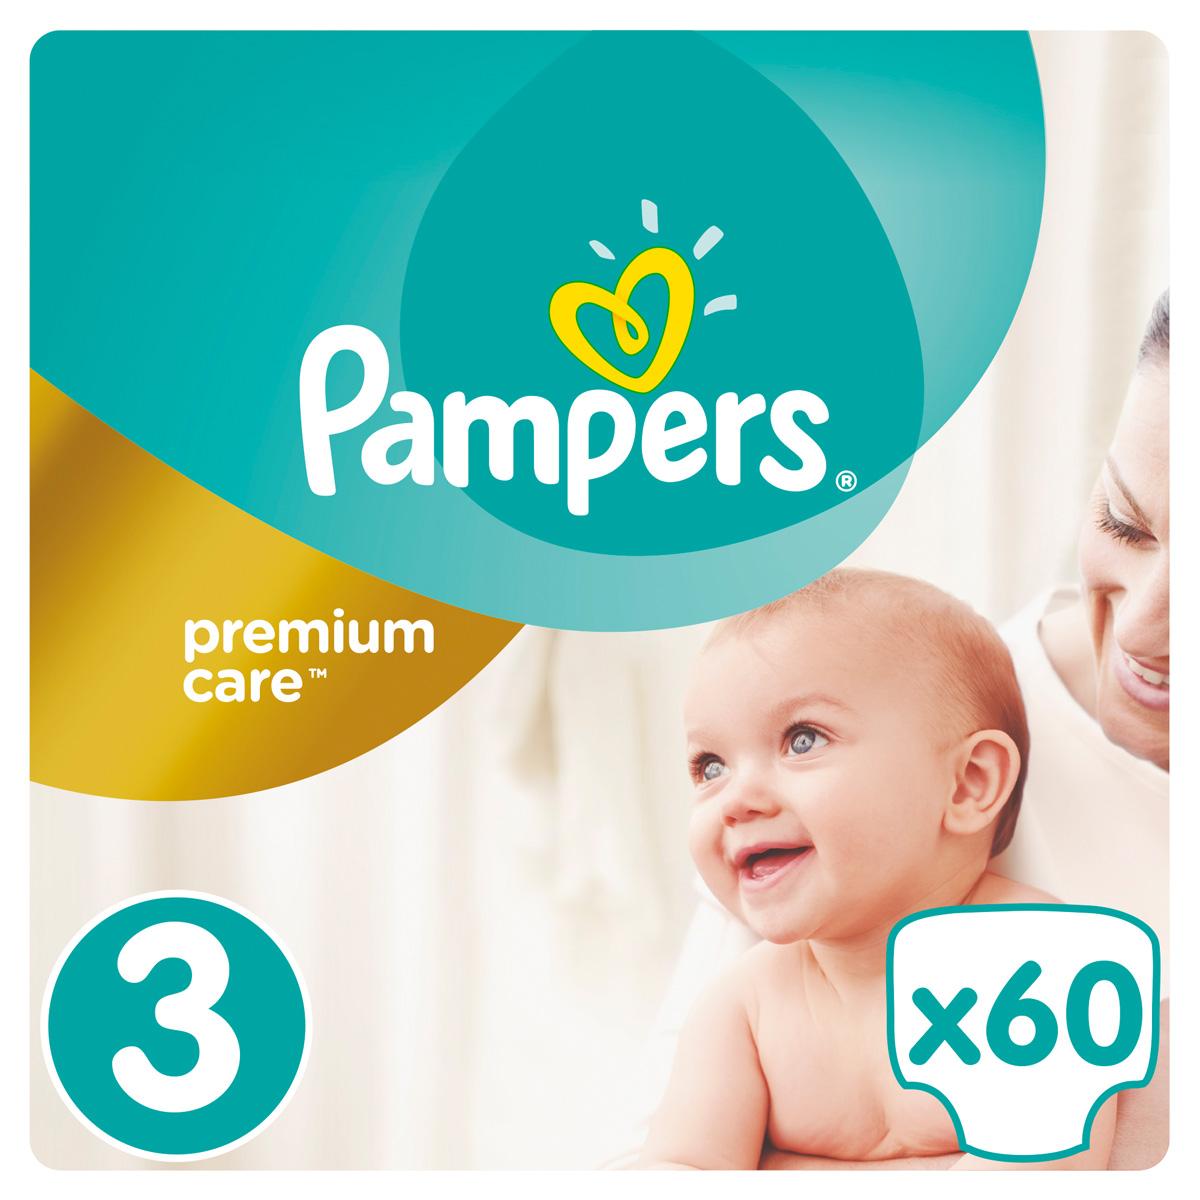 Pampers Premium Care Подгузники 3, 5-9 кг, 60 шт - Подгузники и пеленки